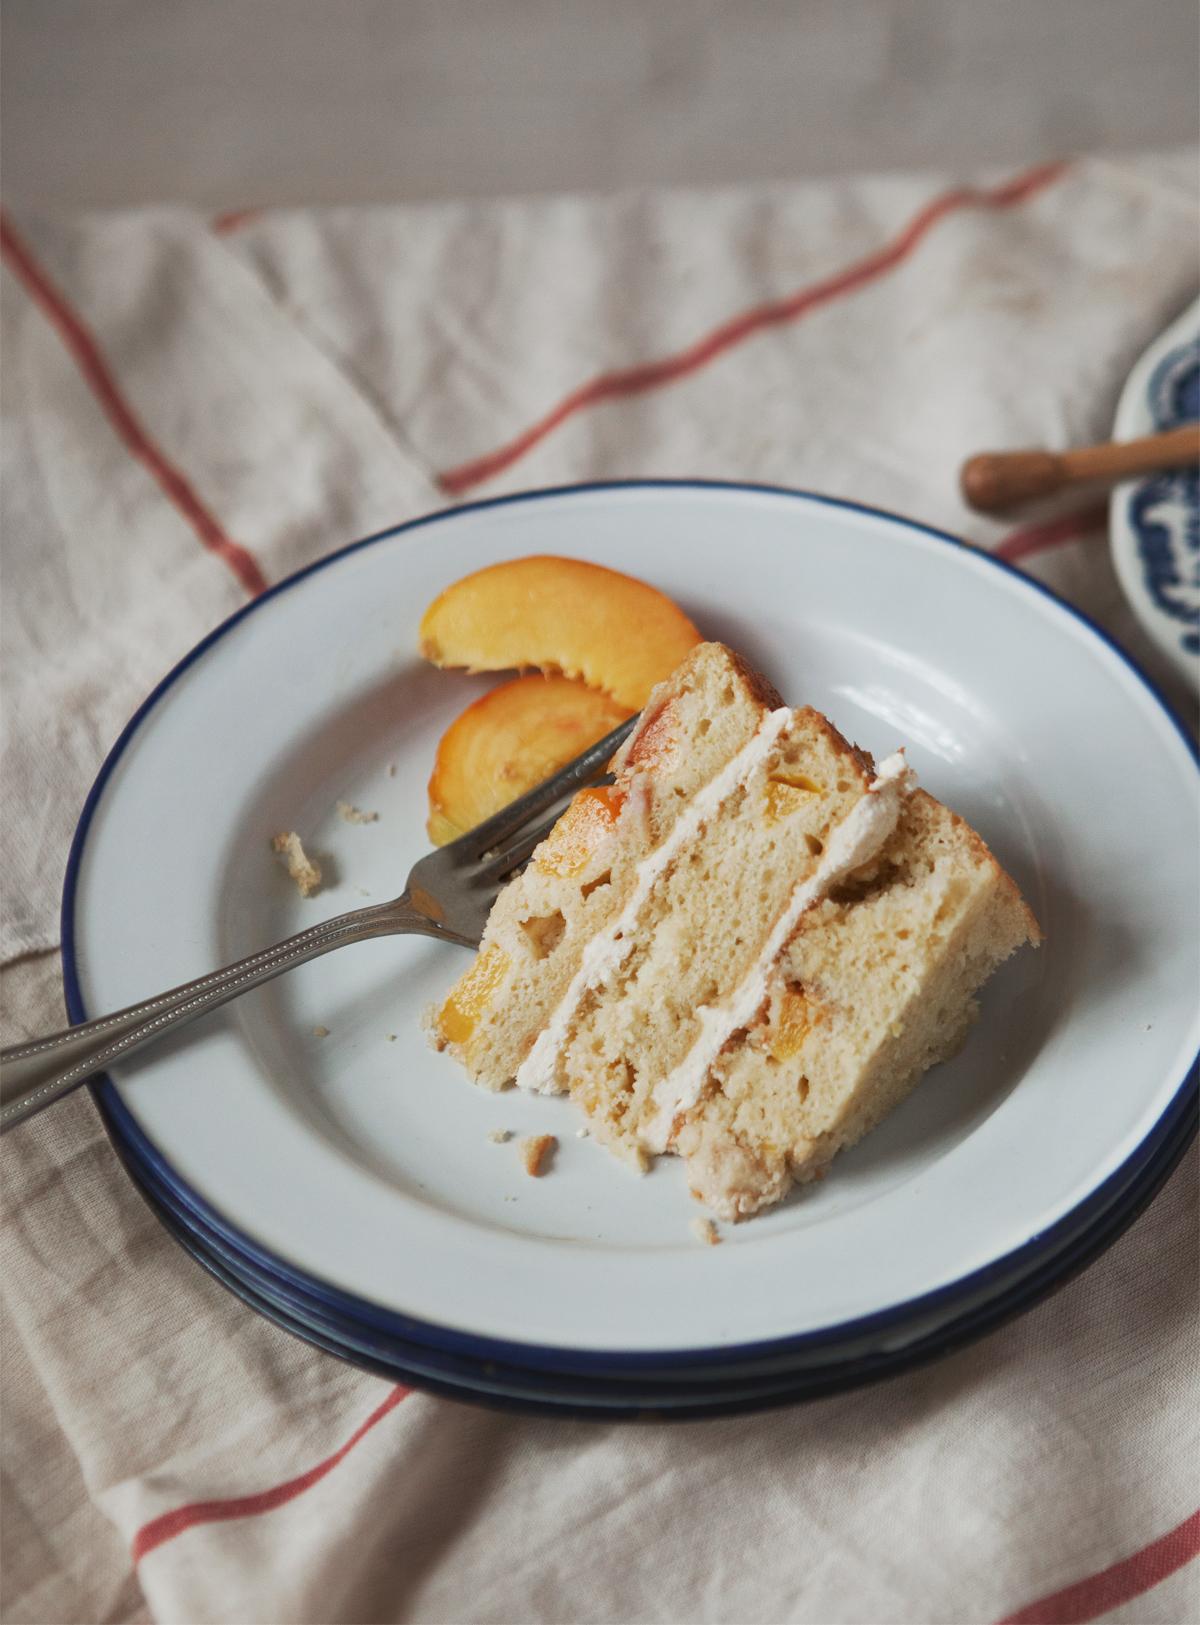 vanilla-peach-cake-with-honey-buttercream-frosting_02.jpg